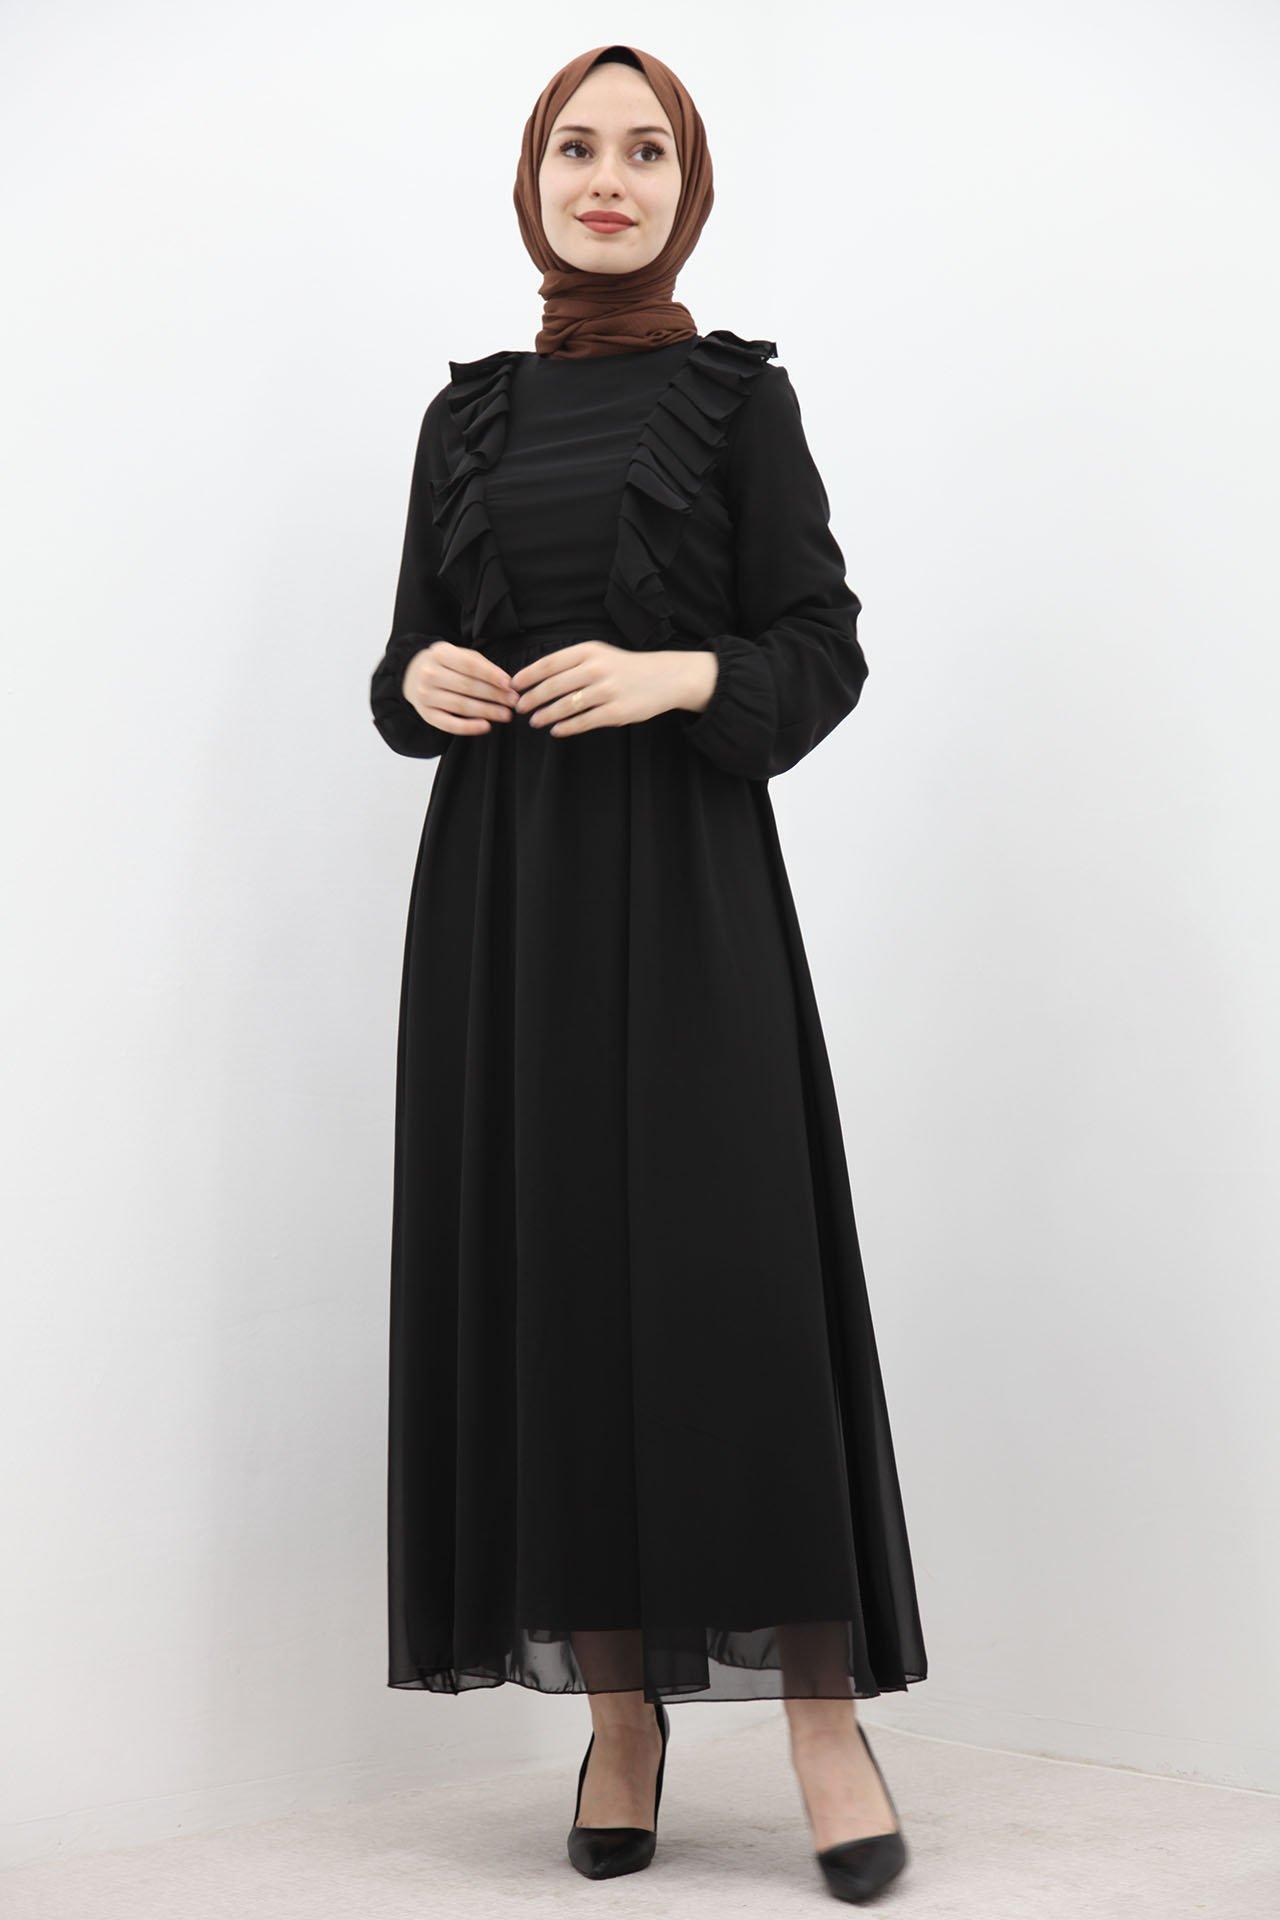 GİZAGİYİM - Kol Ucu Lastikli Elbise Siyah